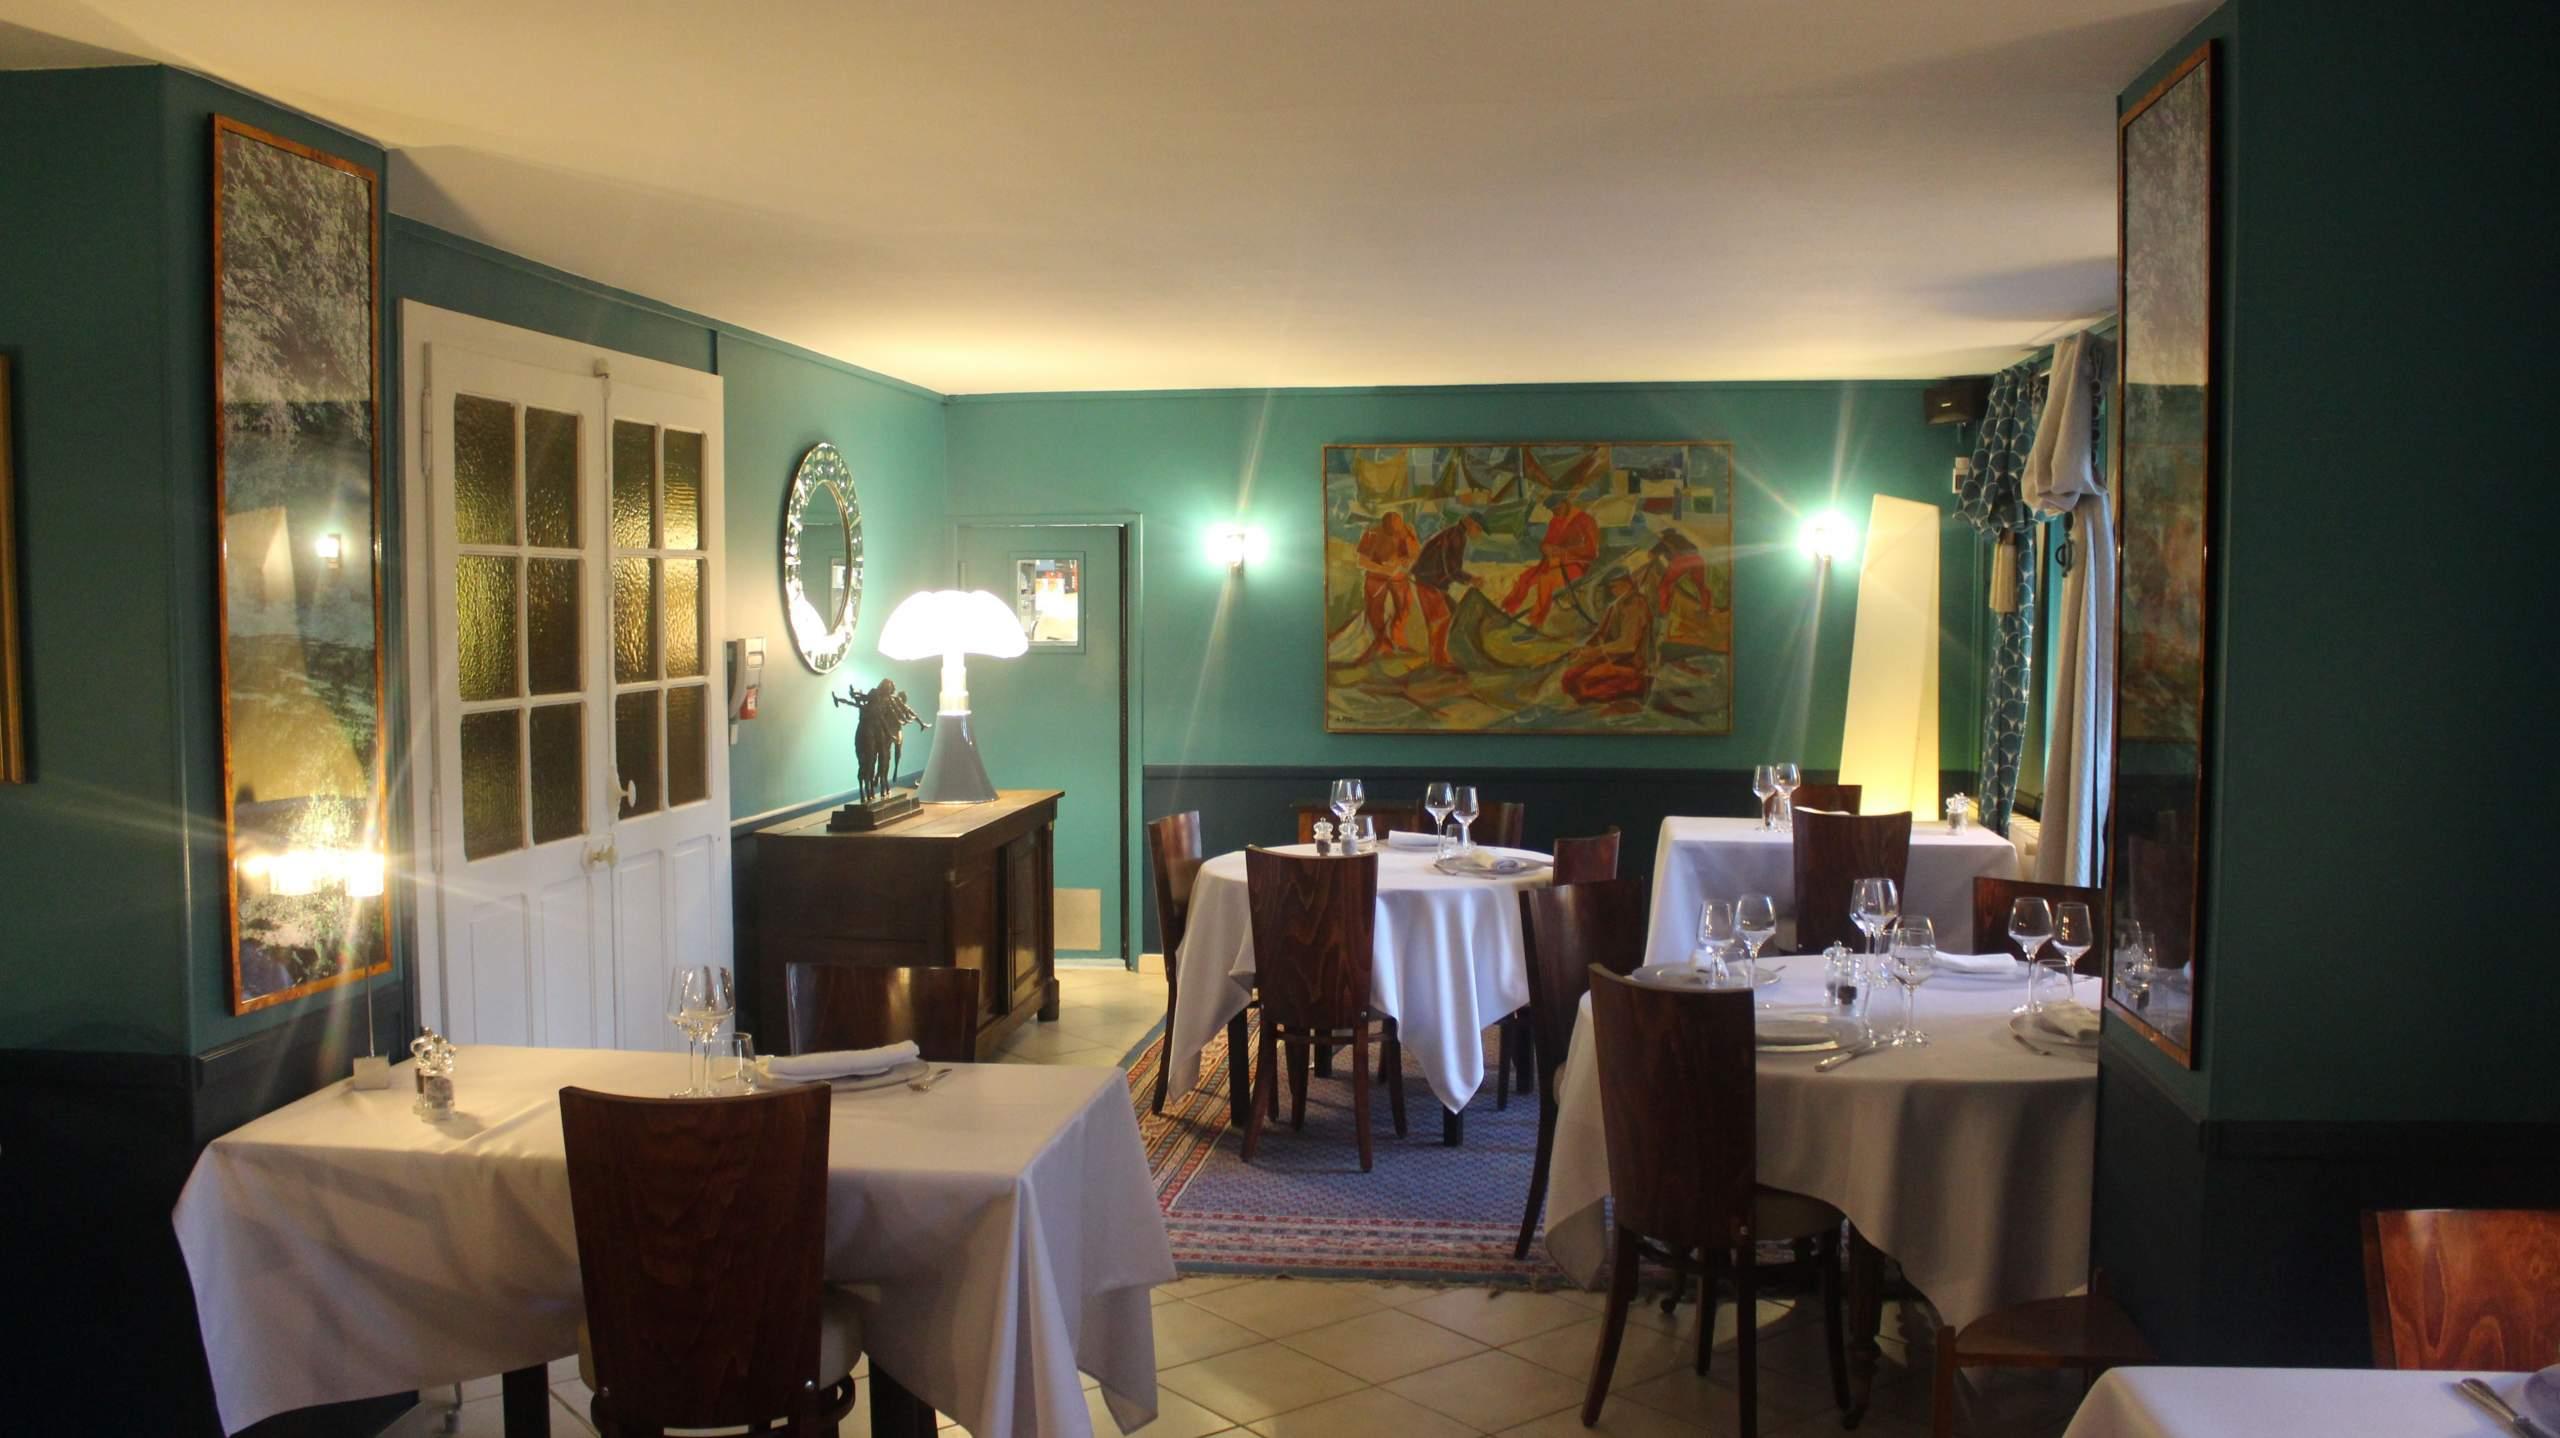 Restaurant haute marne · La Source Bleue · Hotel de Charme Insolite Haute-Marne